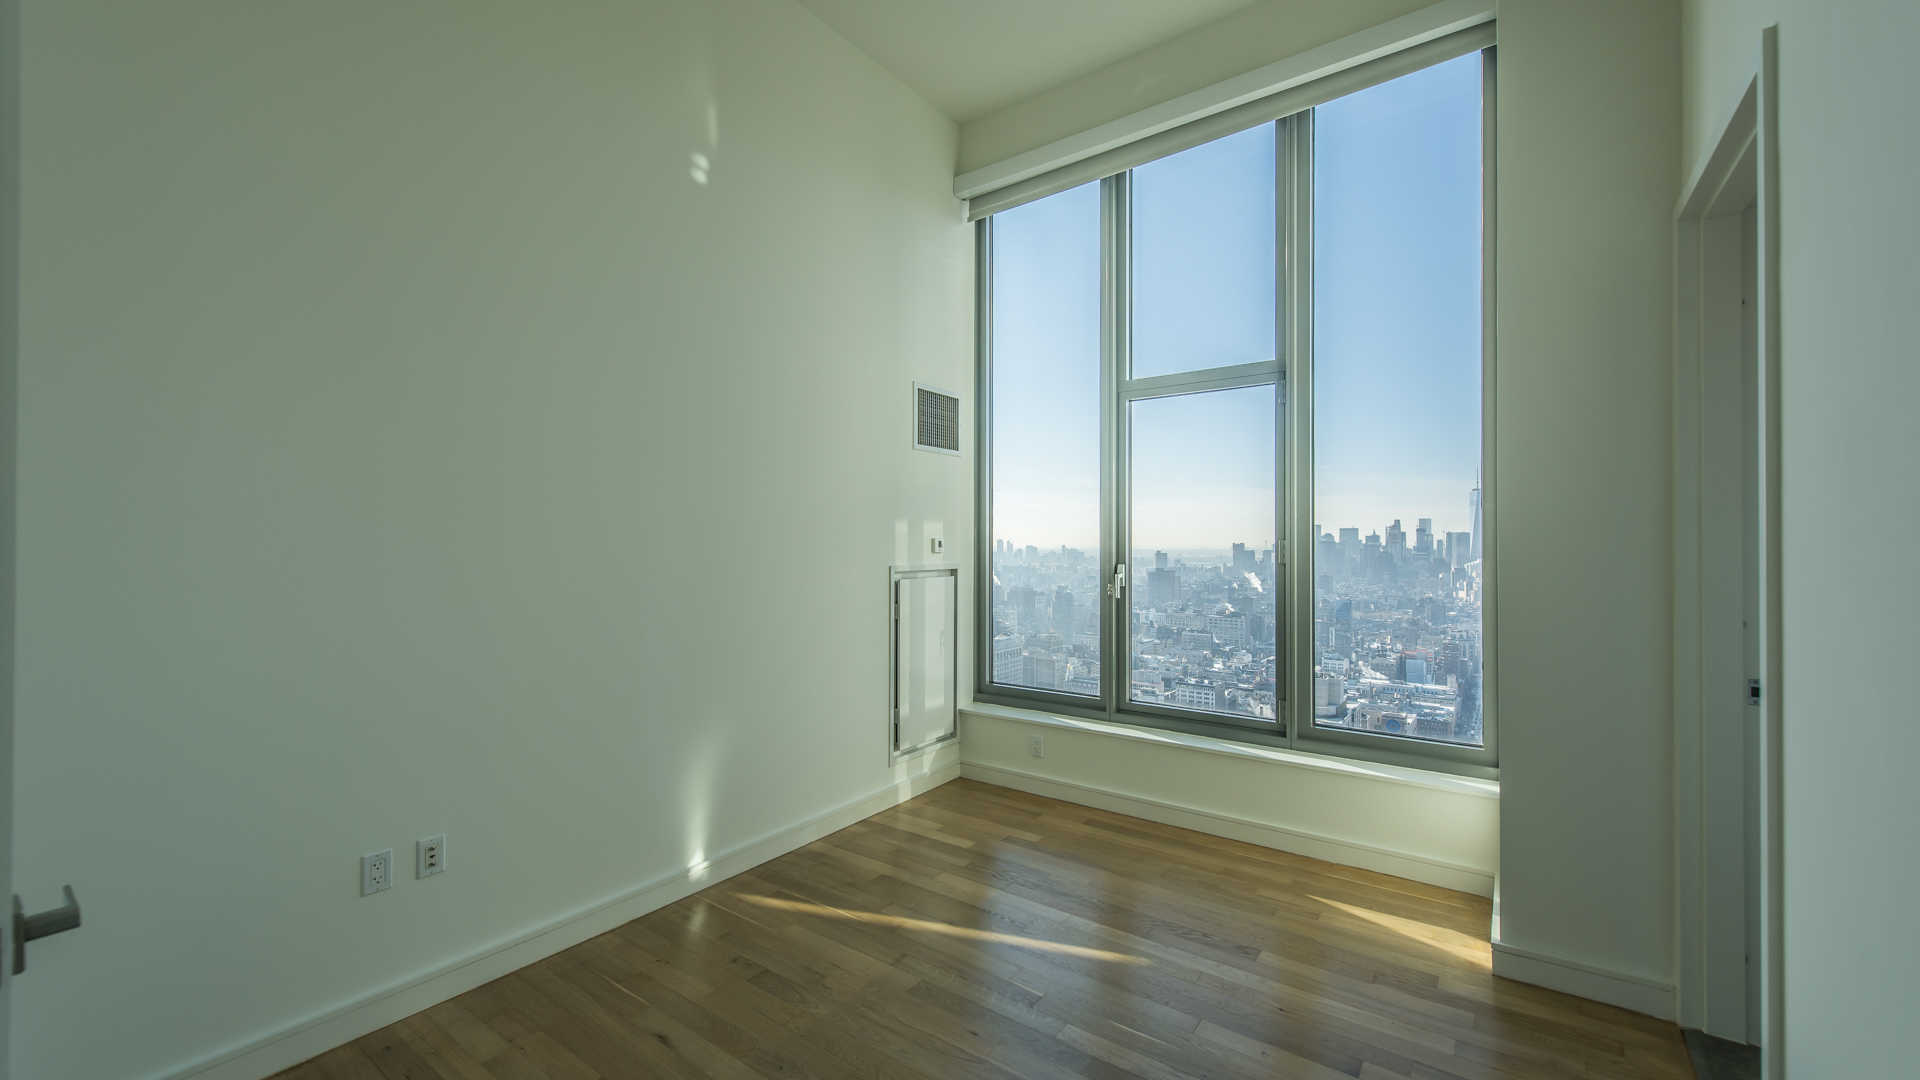 Bedroom with Oversized Windows and Hardwood Flooring